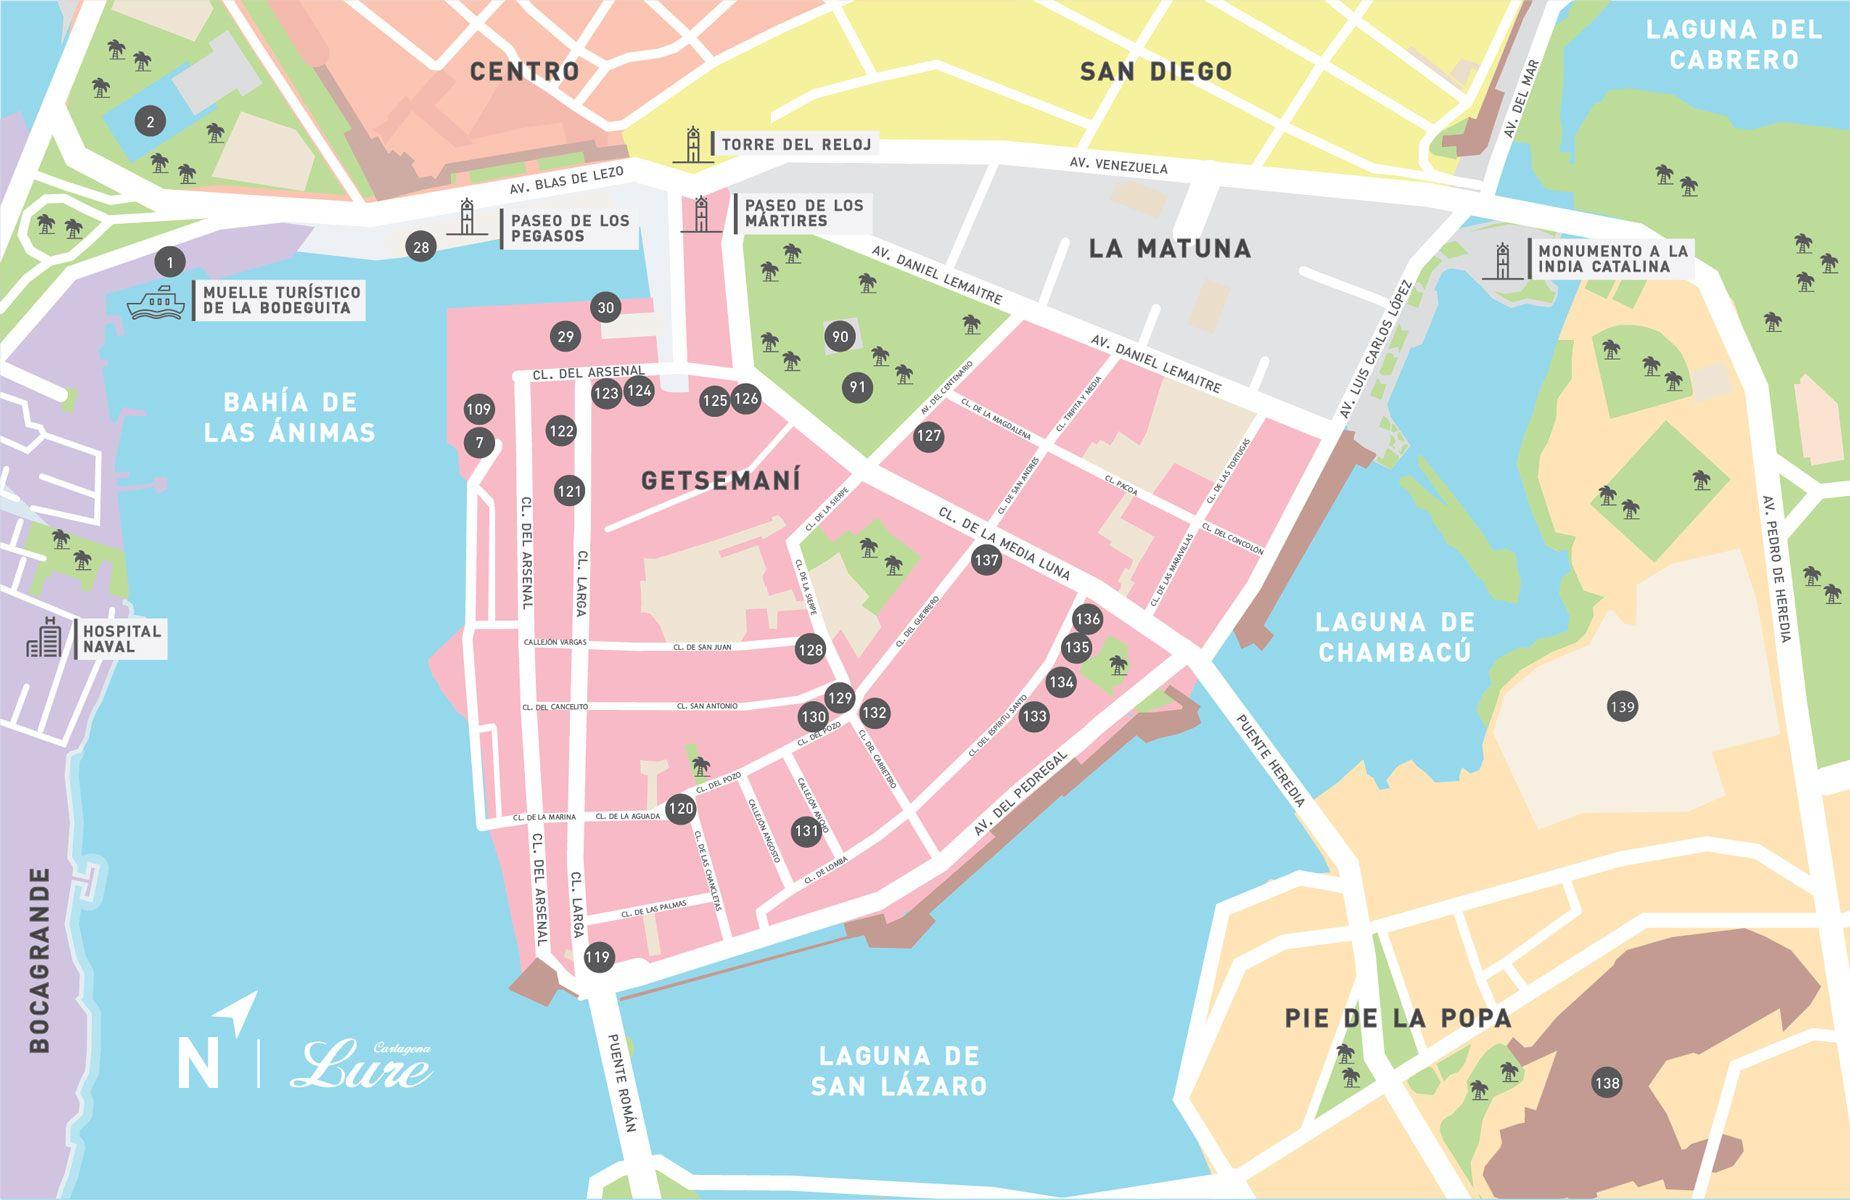 Colombia On World Map%0A  MAPA  Getseman    Legenda no link  CartagenaColombiaMapsSup